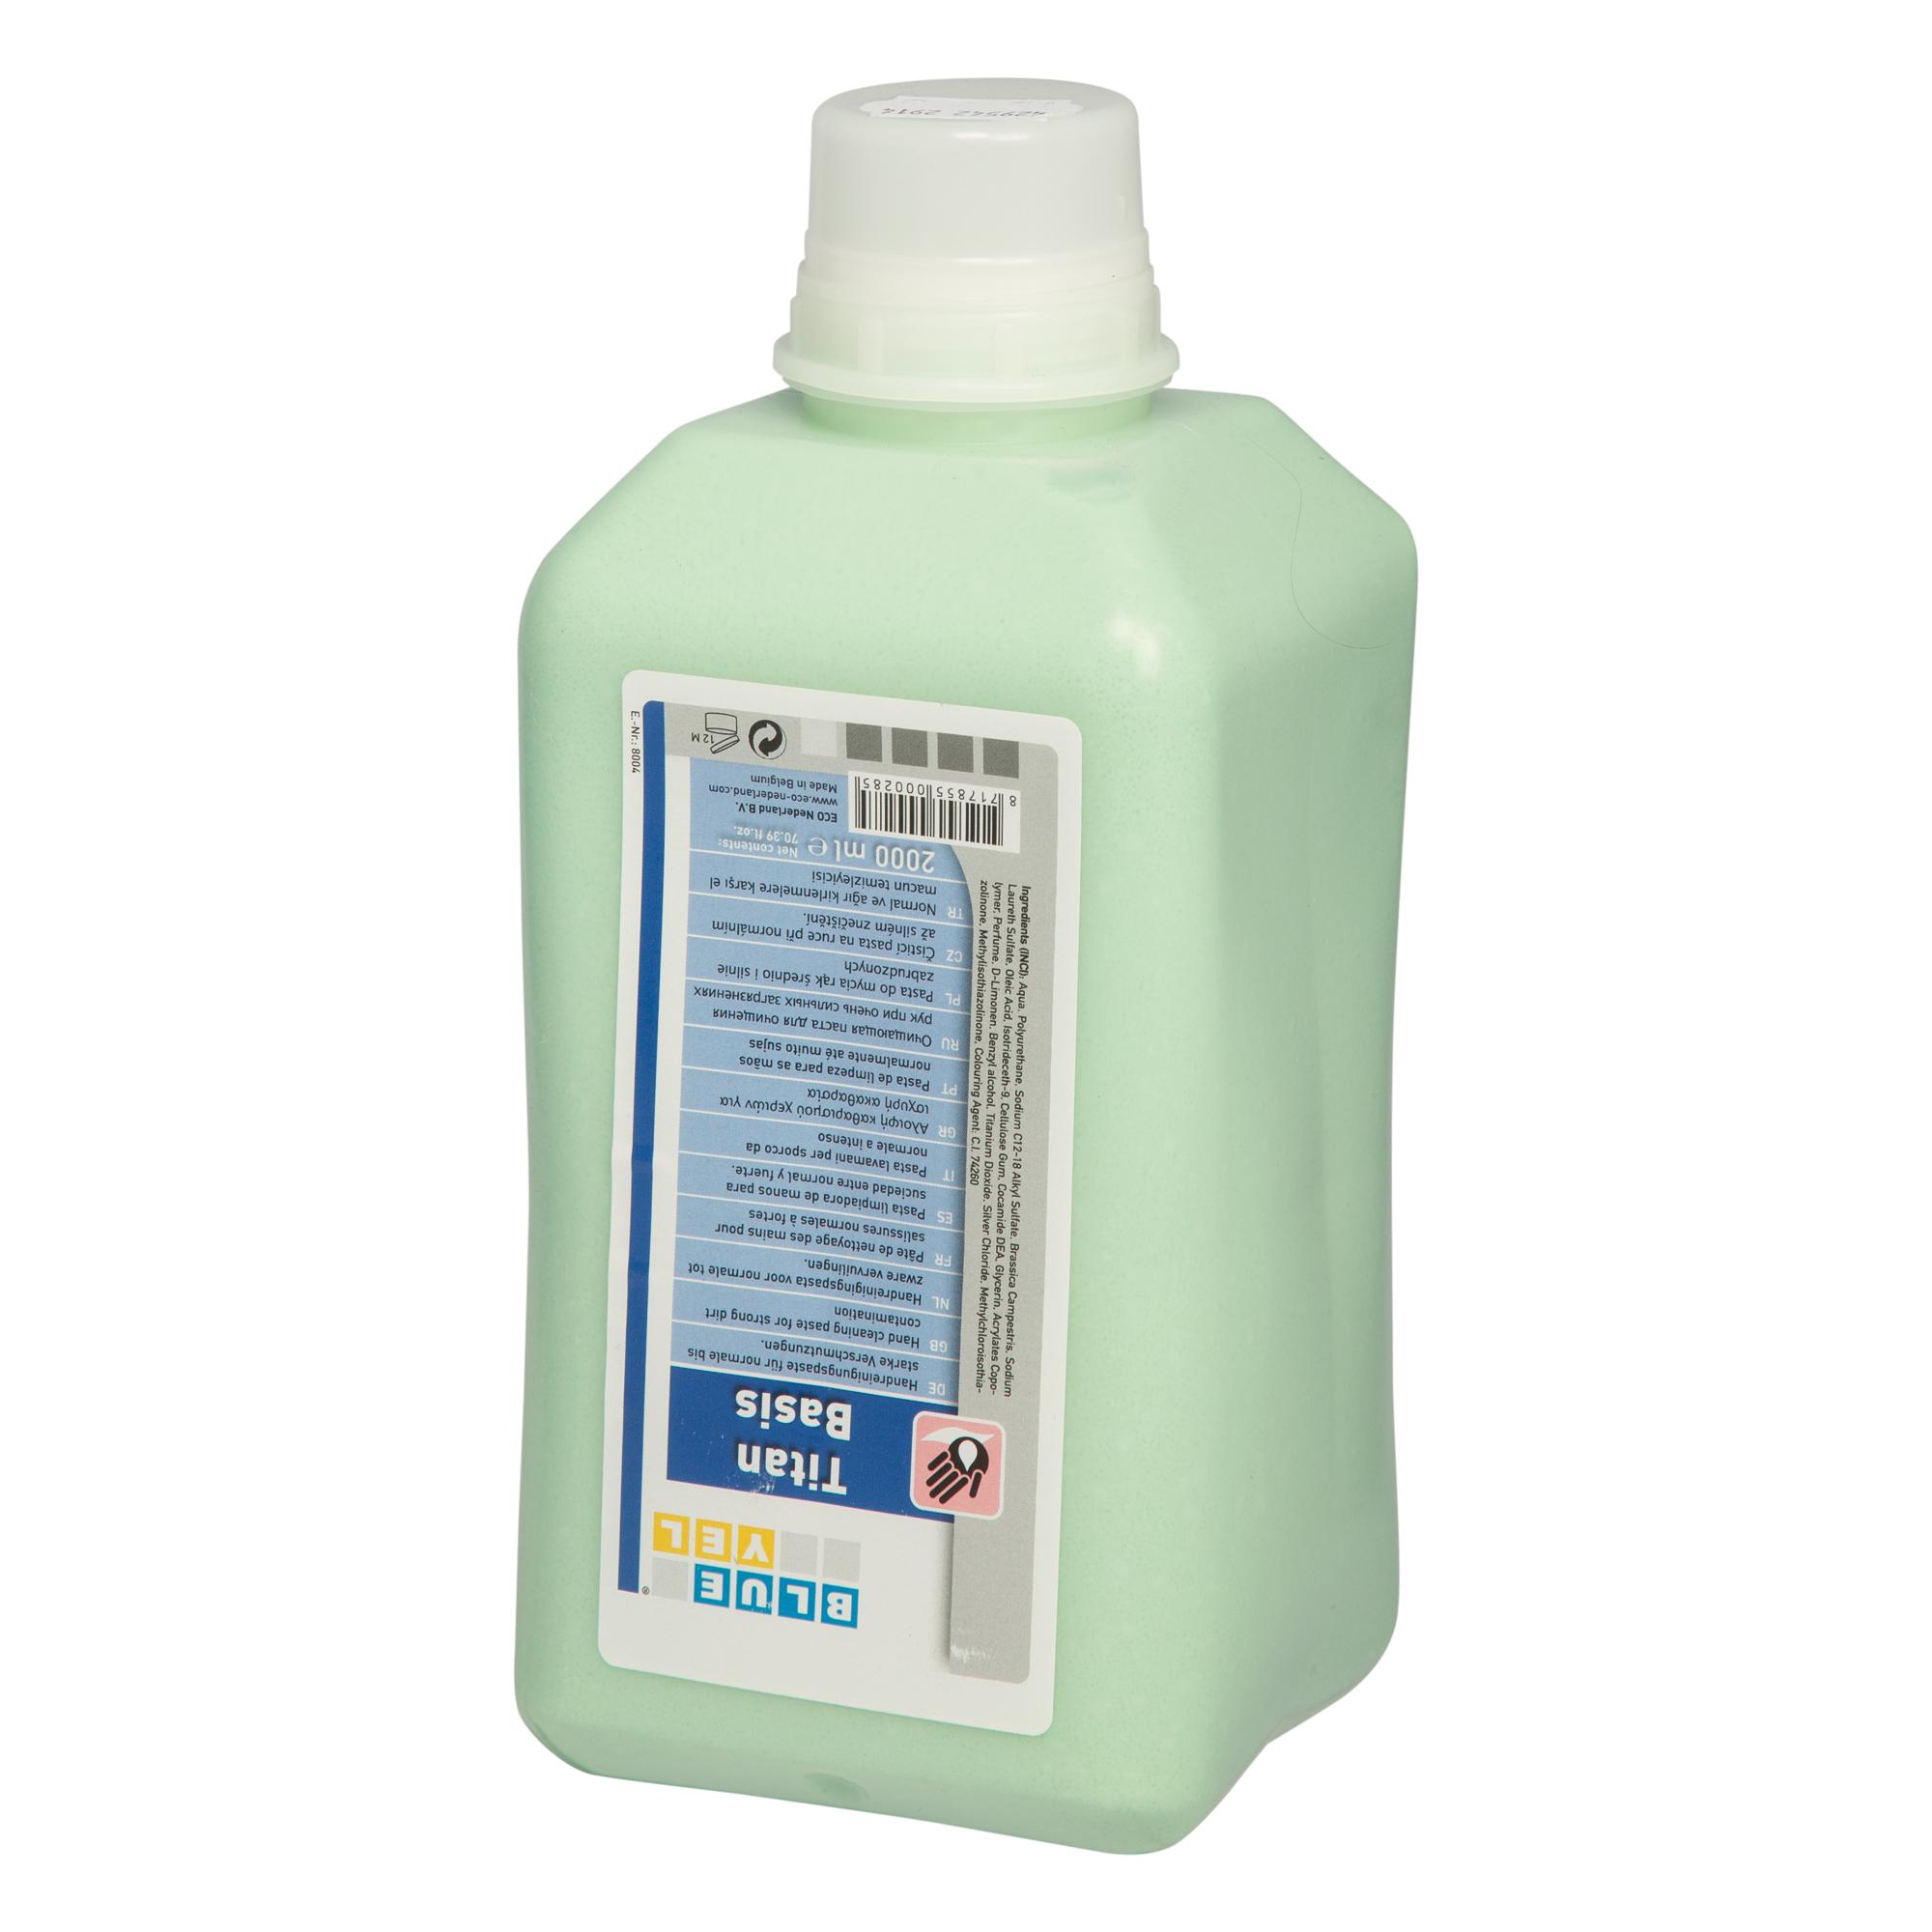 Handreiniger Titan Basis, 2000 ml